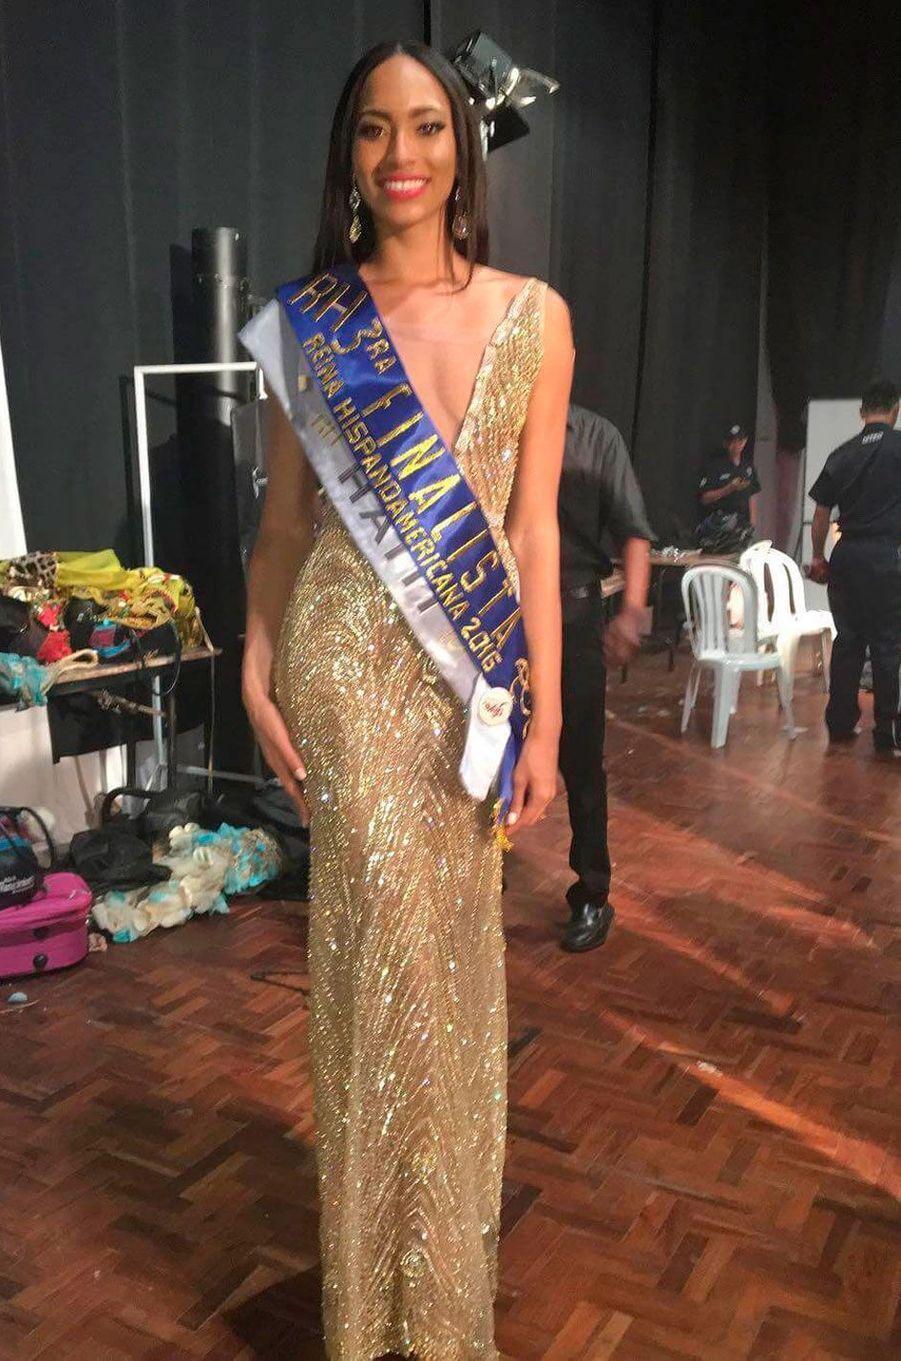 Miss Haiti, Raquel Pelissier